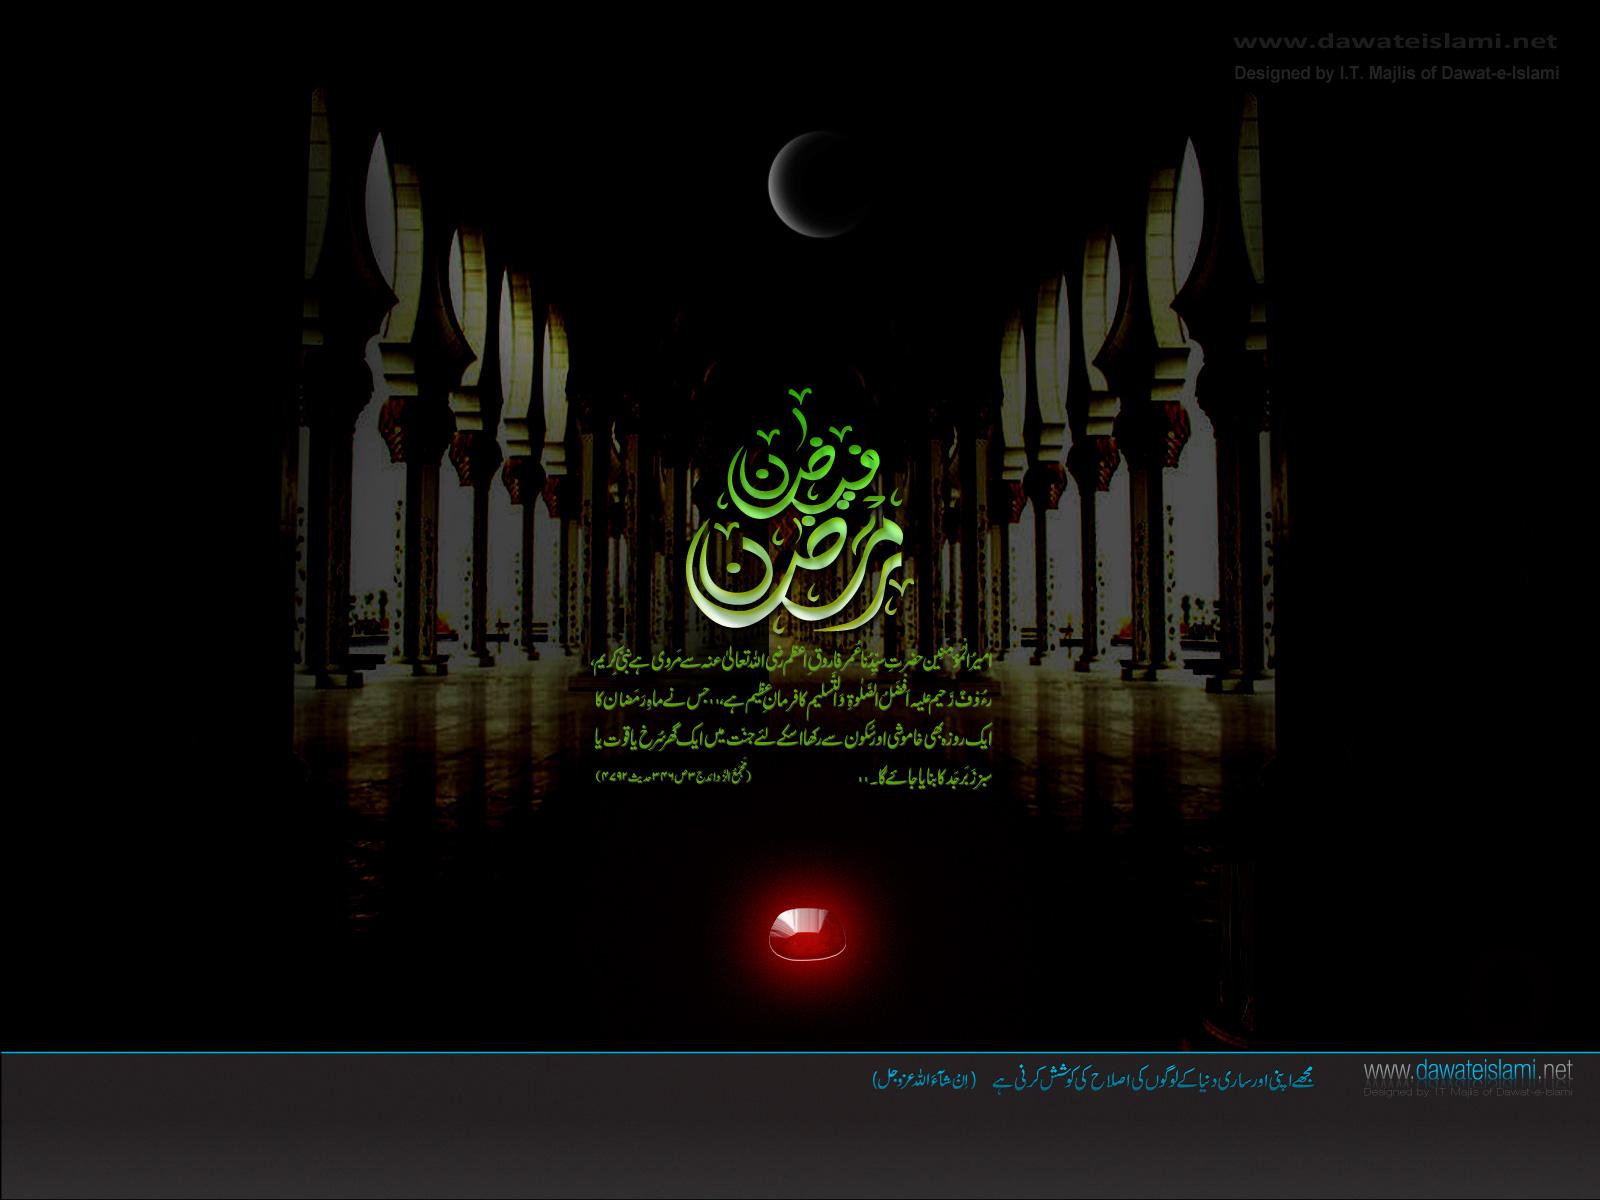 http://2.bp.blogspot.com/-3avCmuPepPg/T_ykbb5HoRI/AAAAAAAAATQ/hBIuZw3VxoA/s1600/ramadan+kareem_wallpapers_by_dawateislami_10.jpg